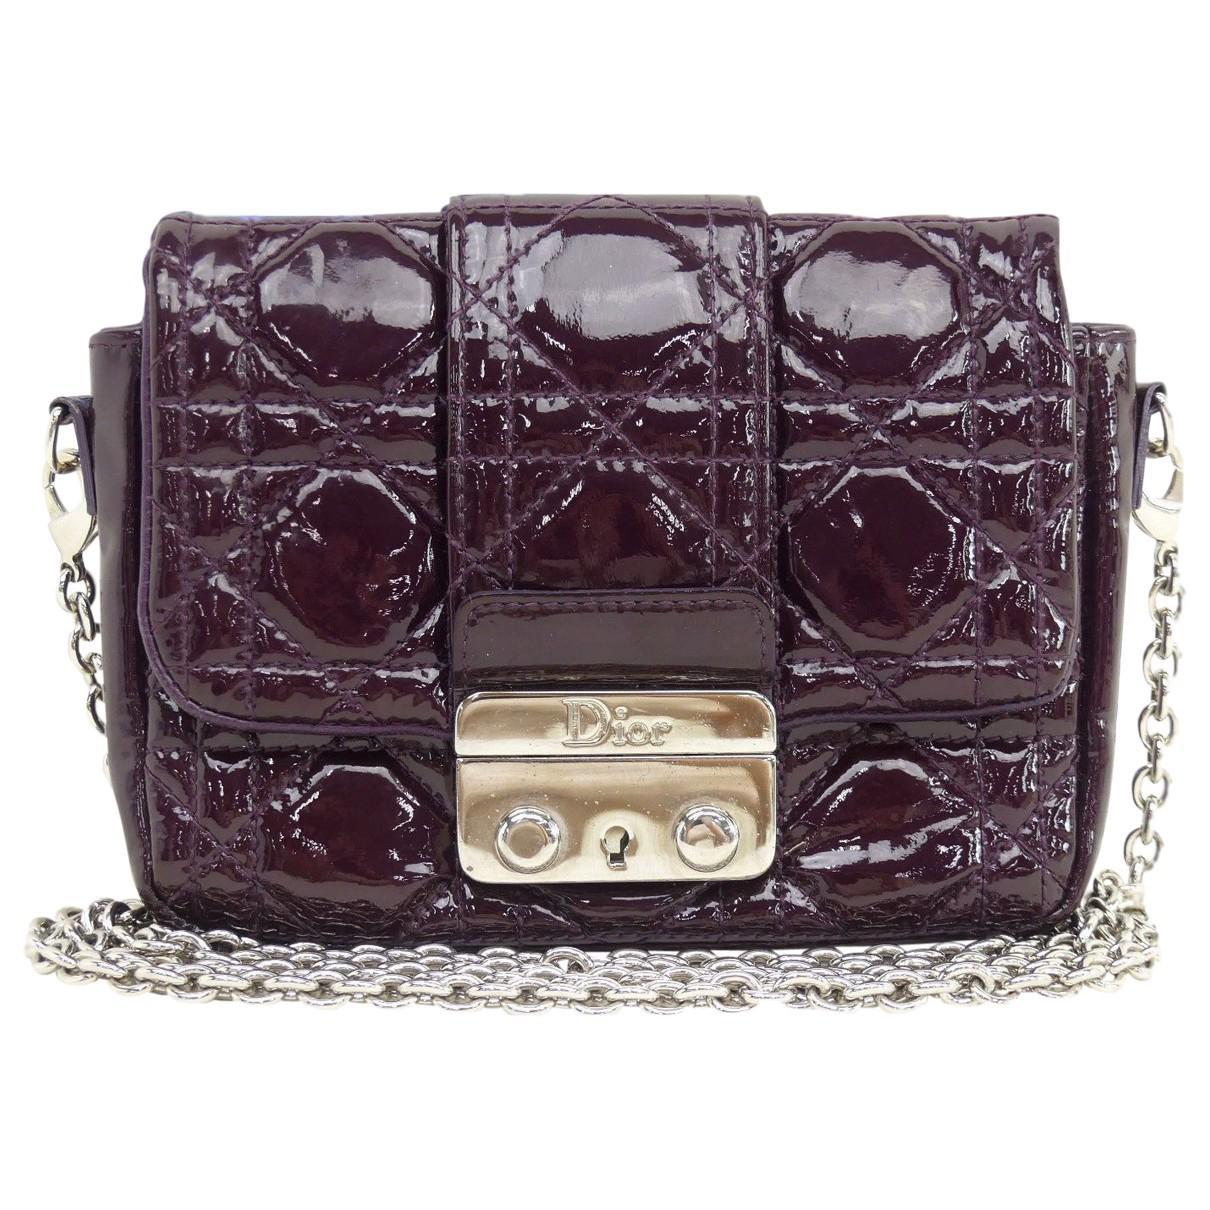 0e13dcf4ec7a Dior Miss Patent Leather Crossbody Bag in Purple - Lyst